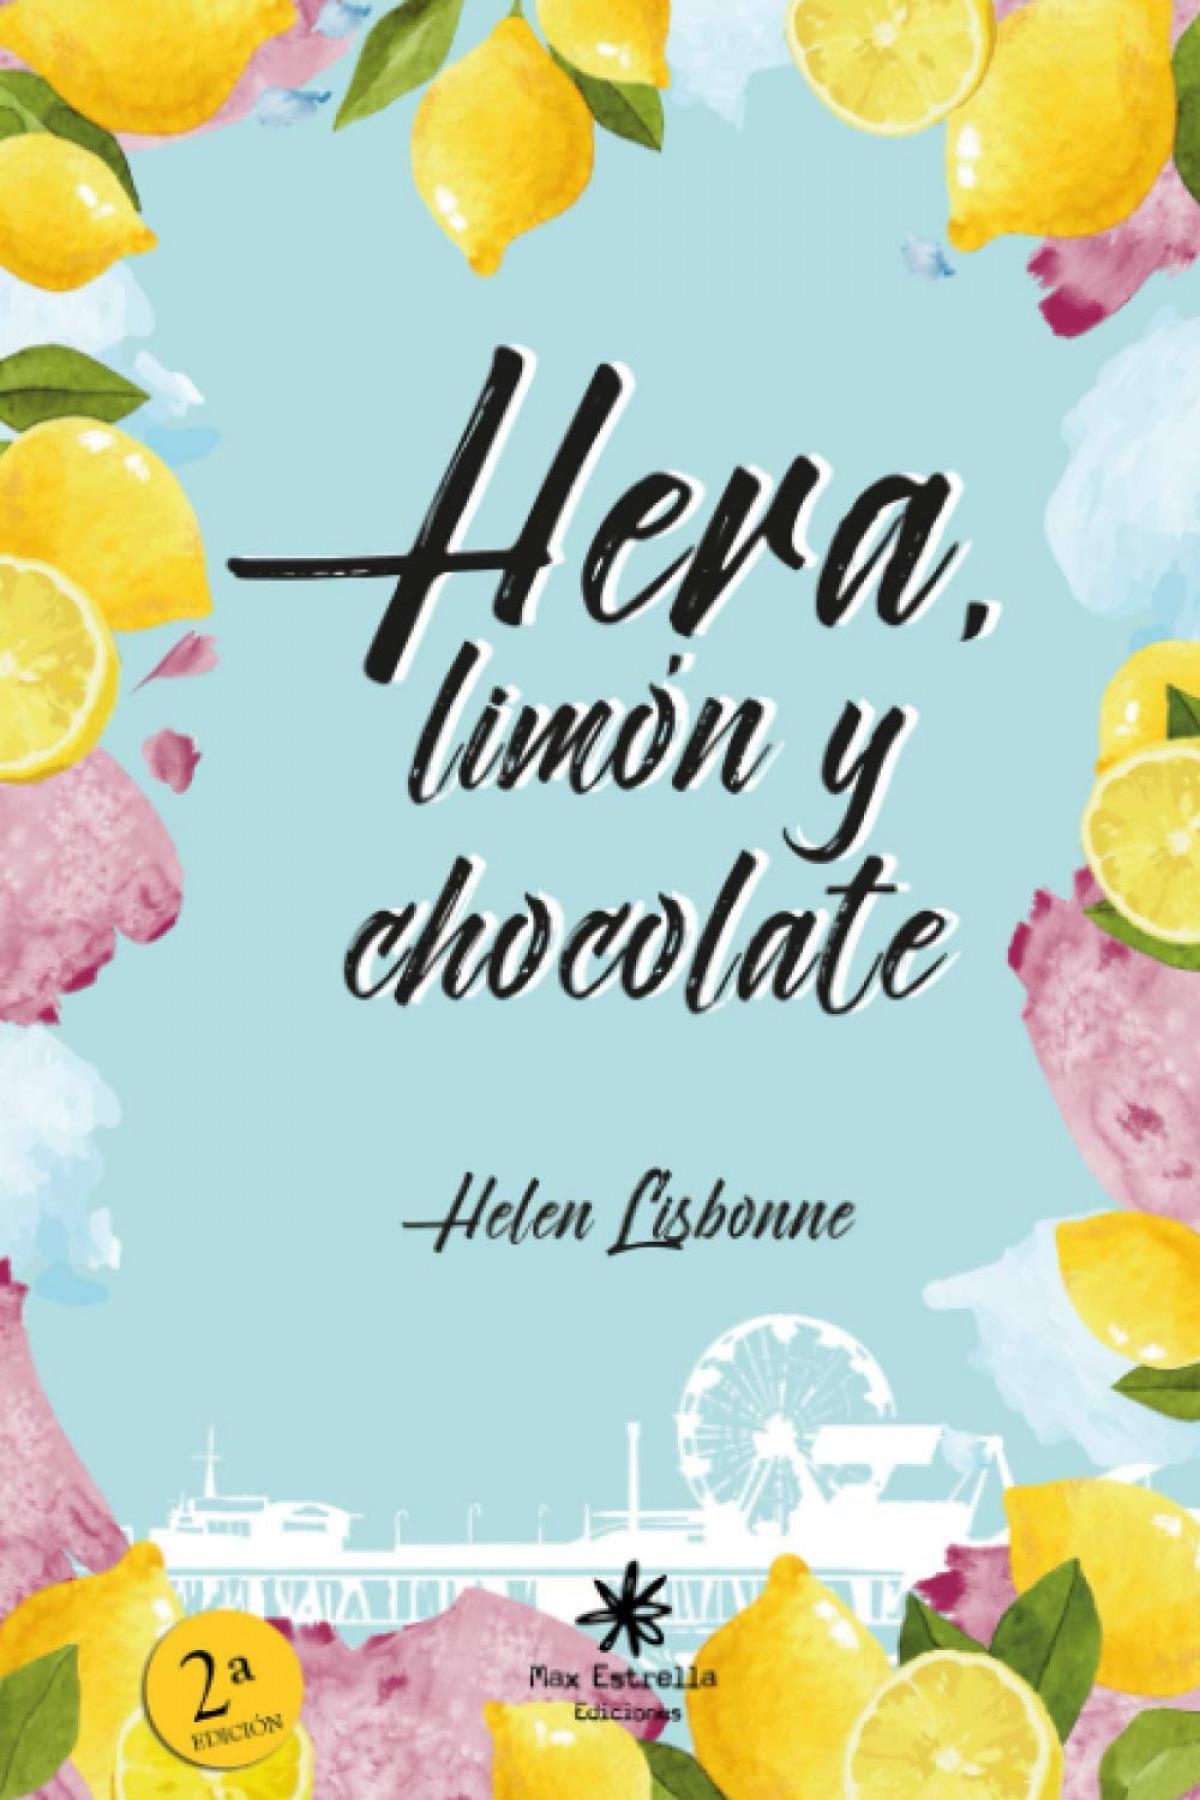 Hera, limón y chocolate 9788417008475